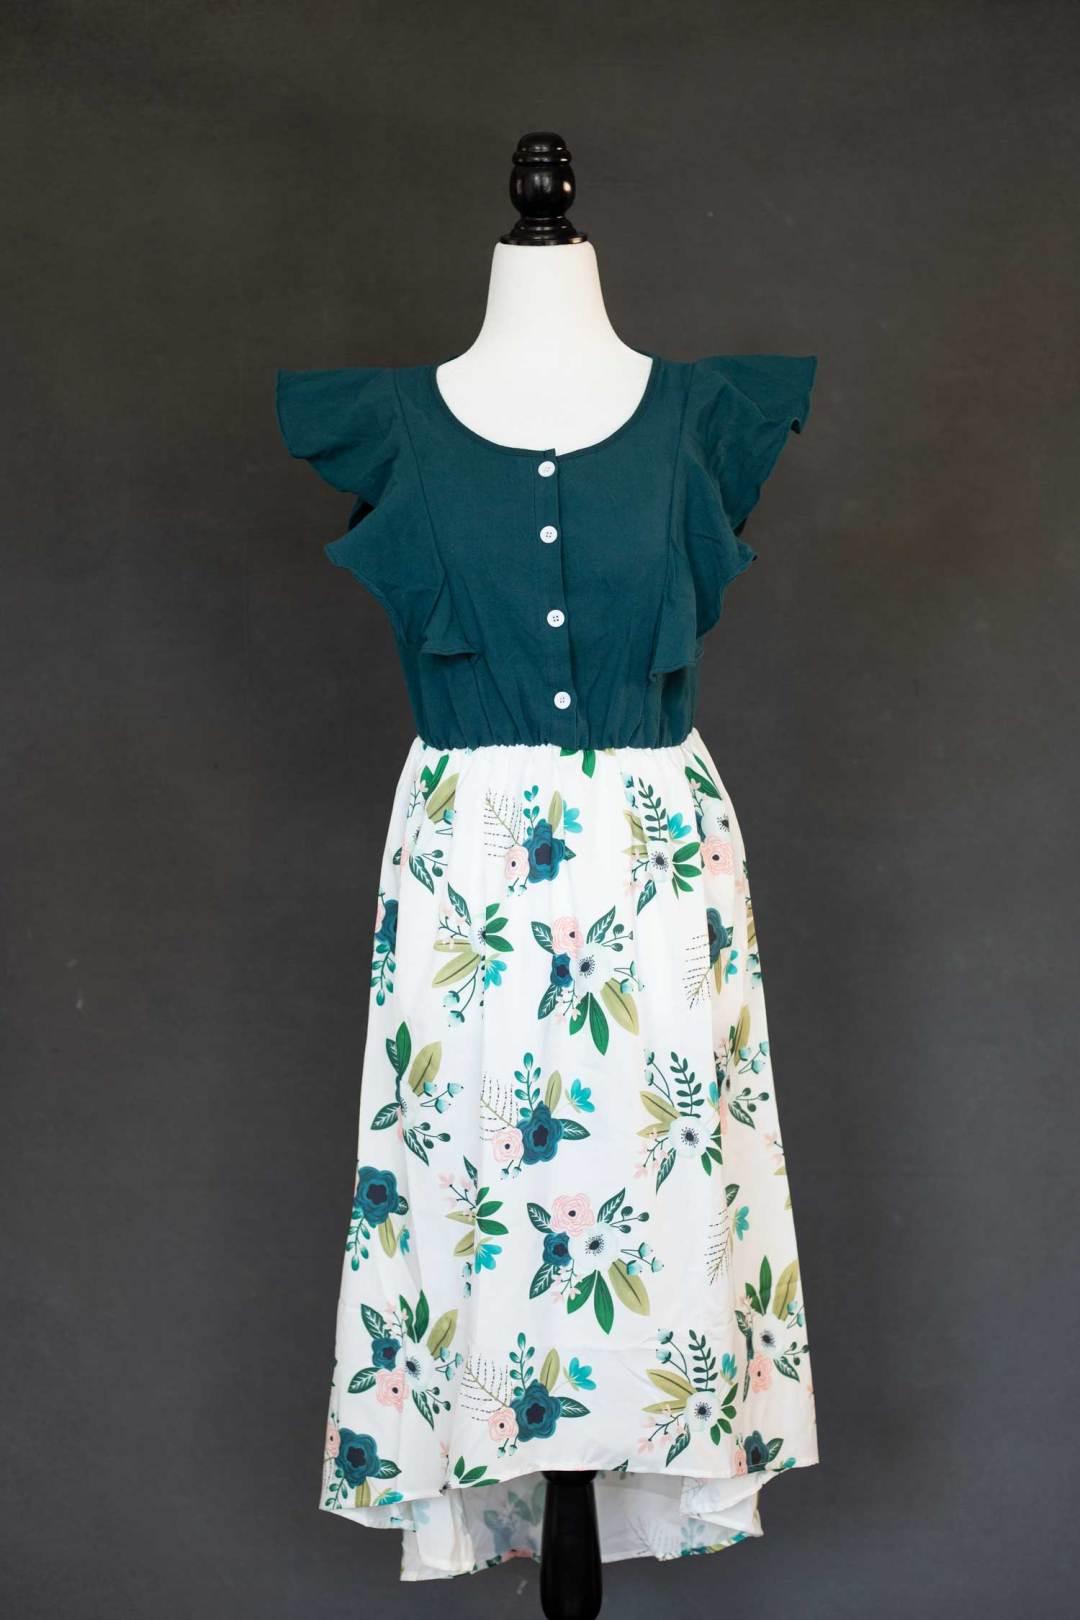 Deep teal floral dress